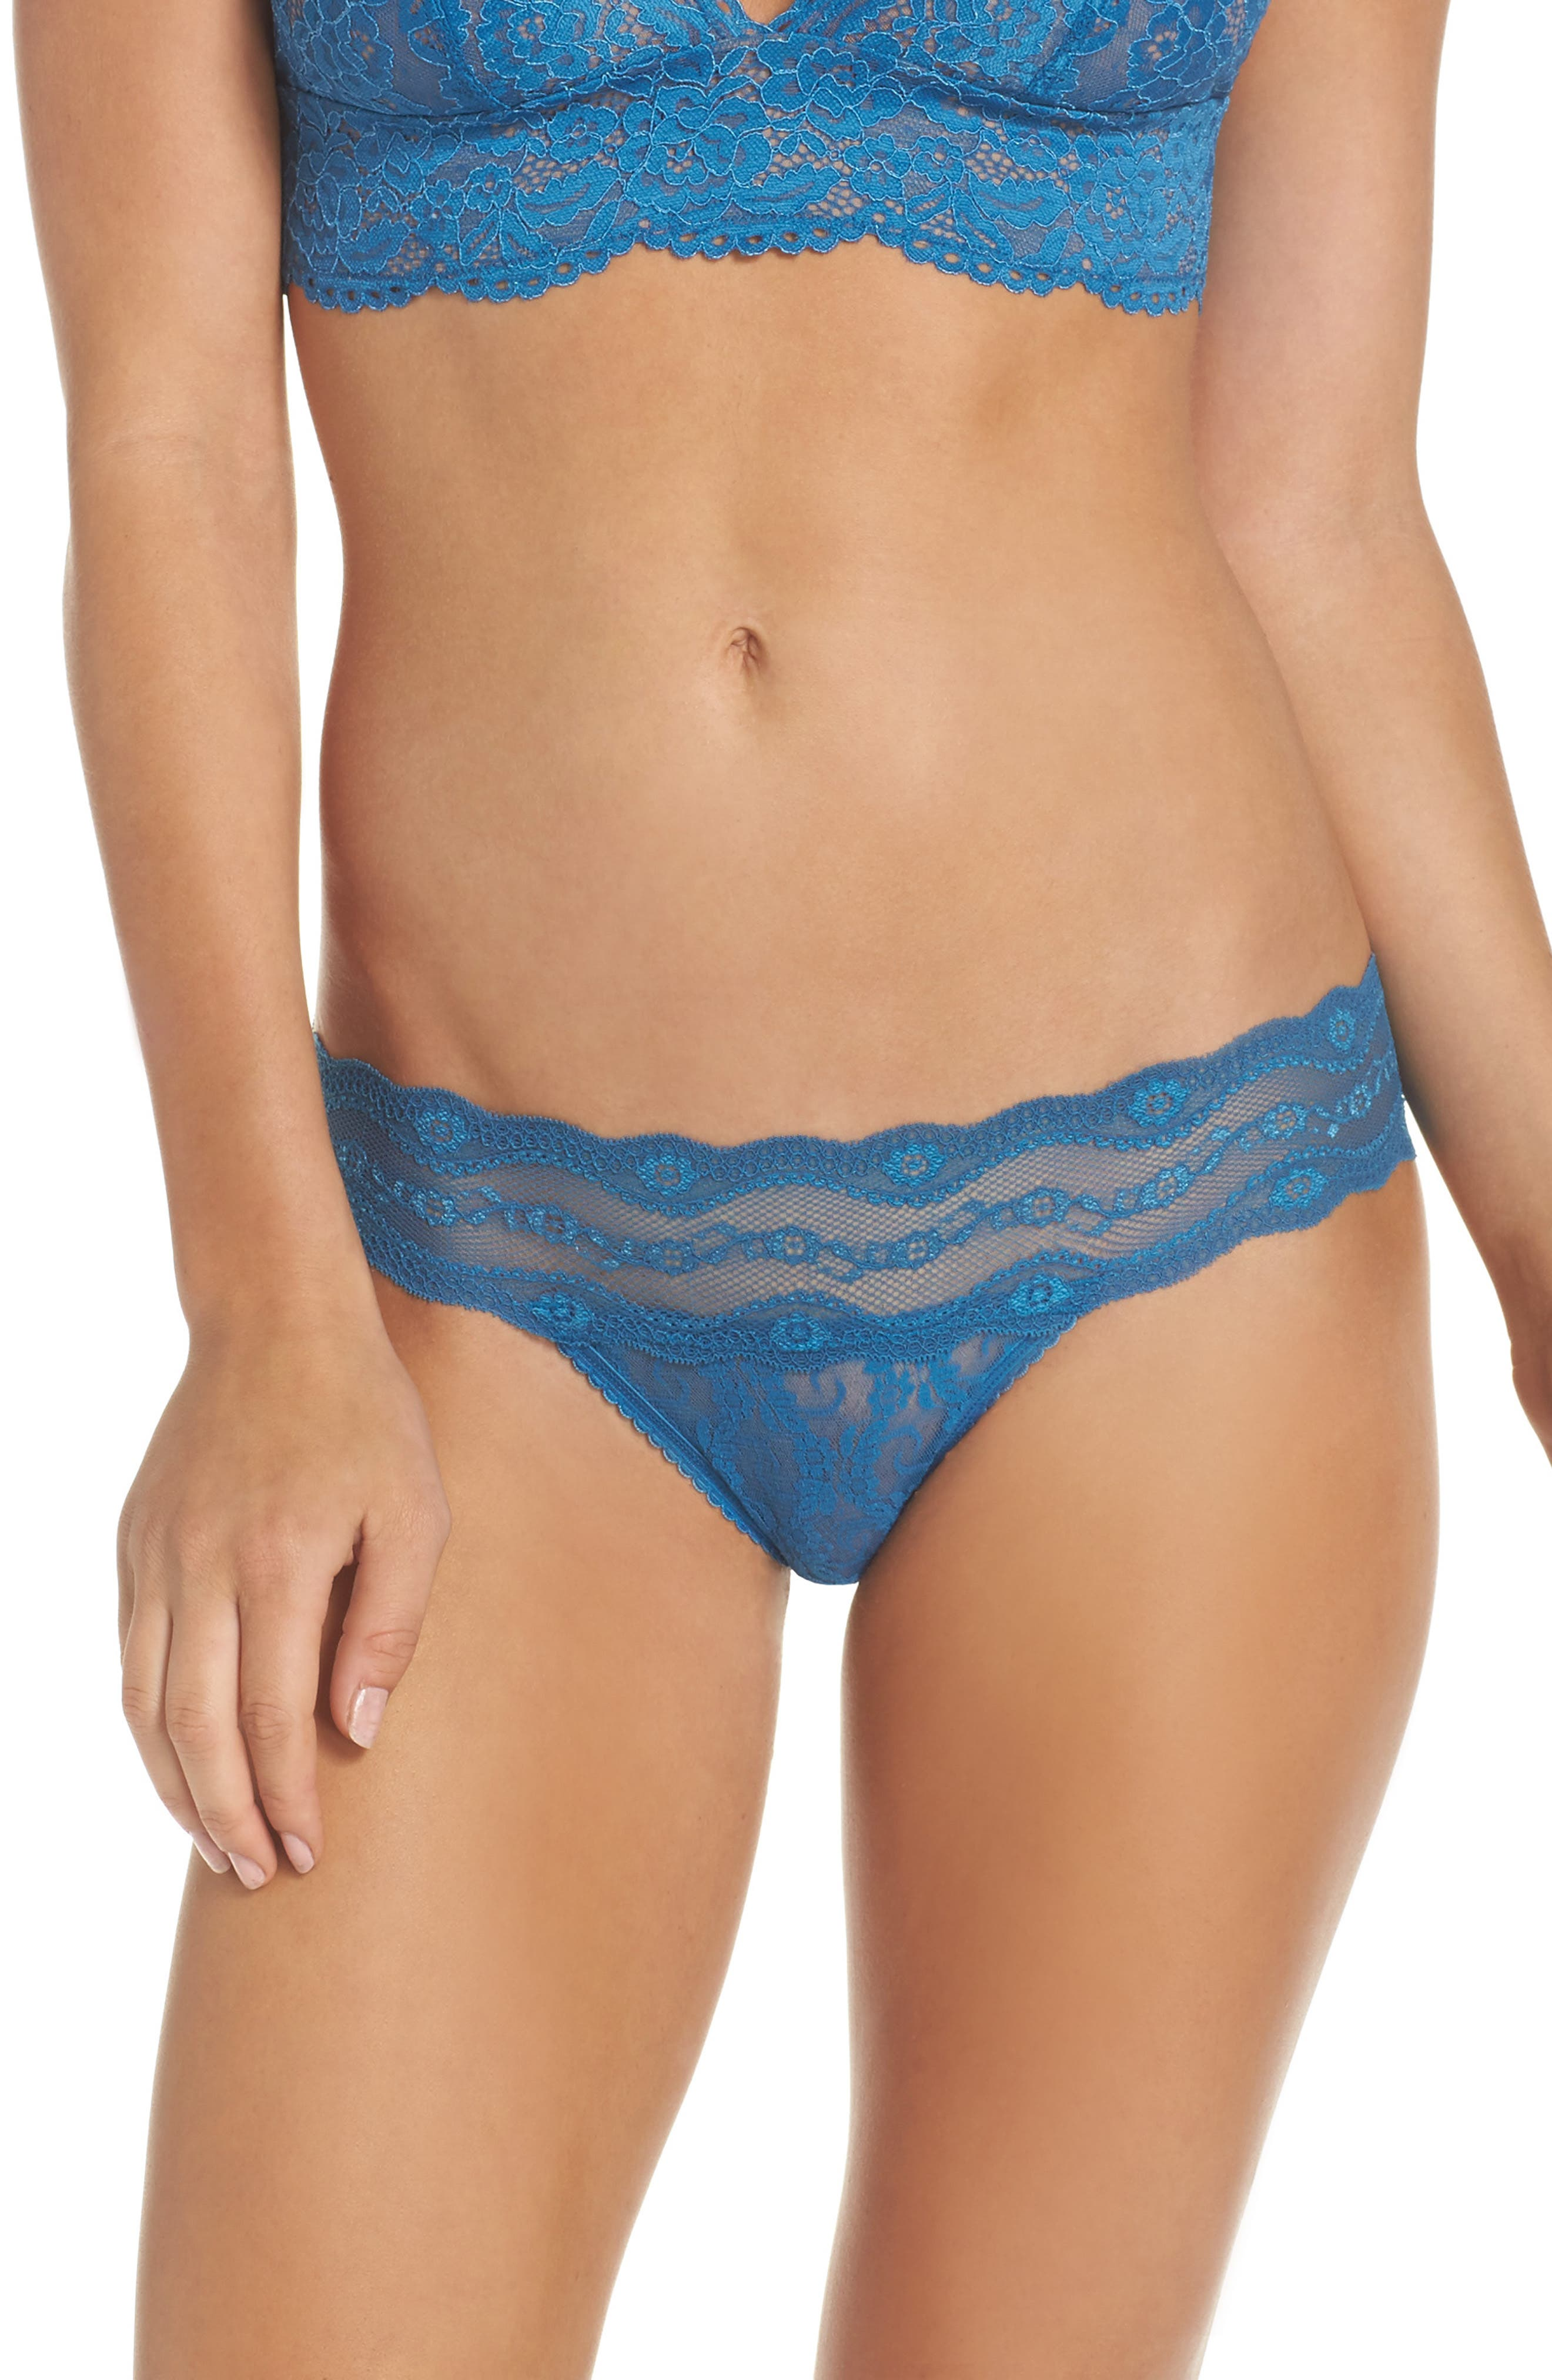 Main Image - b.tempt'd by Wacoal 'Lace Kiss' Bikini (3 for $33)